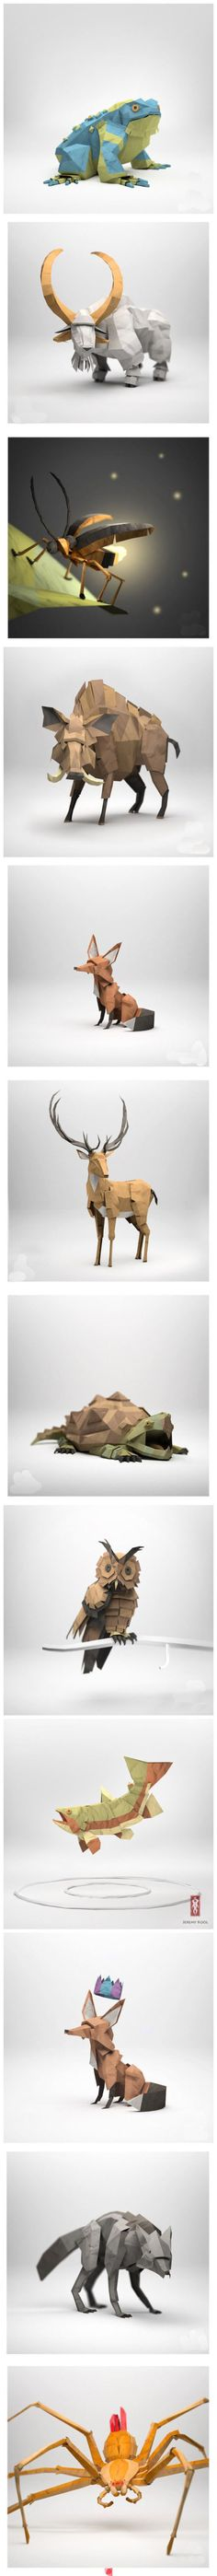 Wonderful paper critters